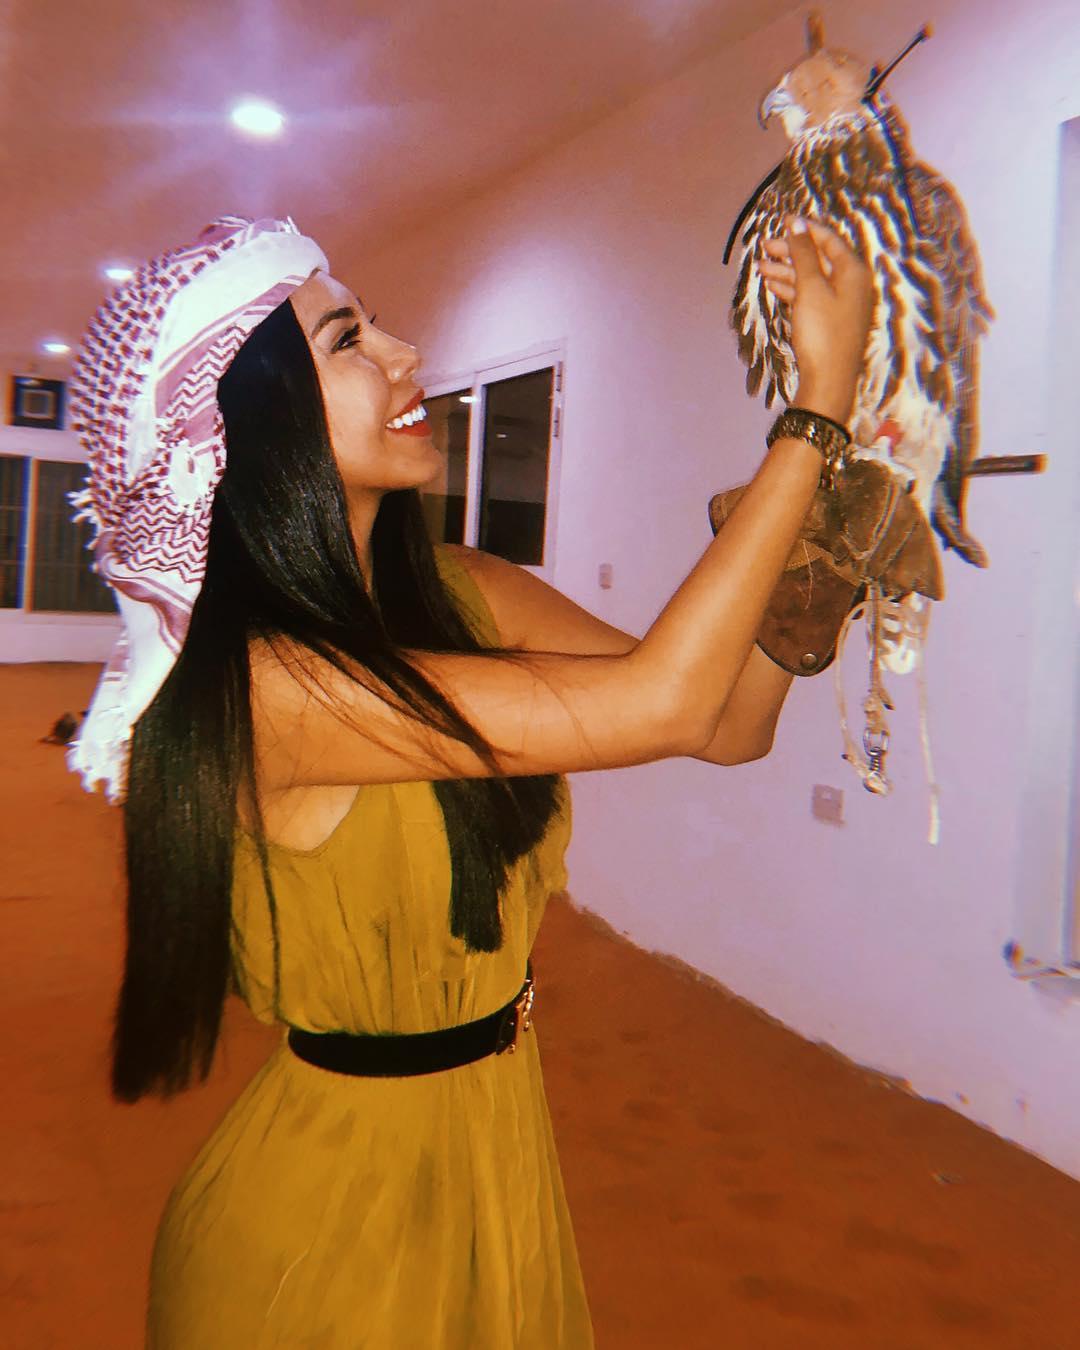 giuliana valenzuela, miss intercontinental peru 2018-2019. 43436810